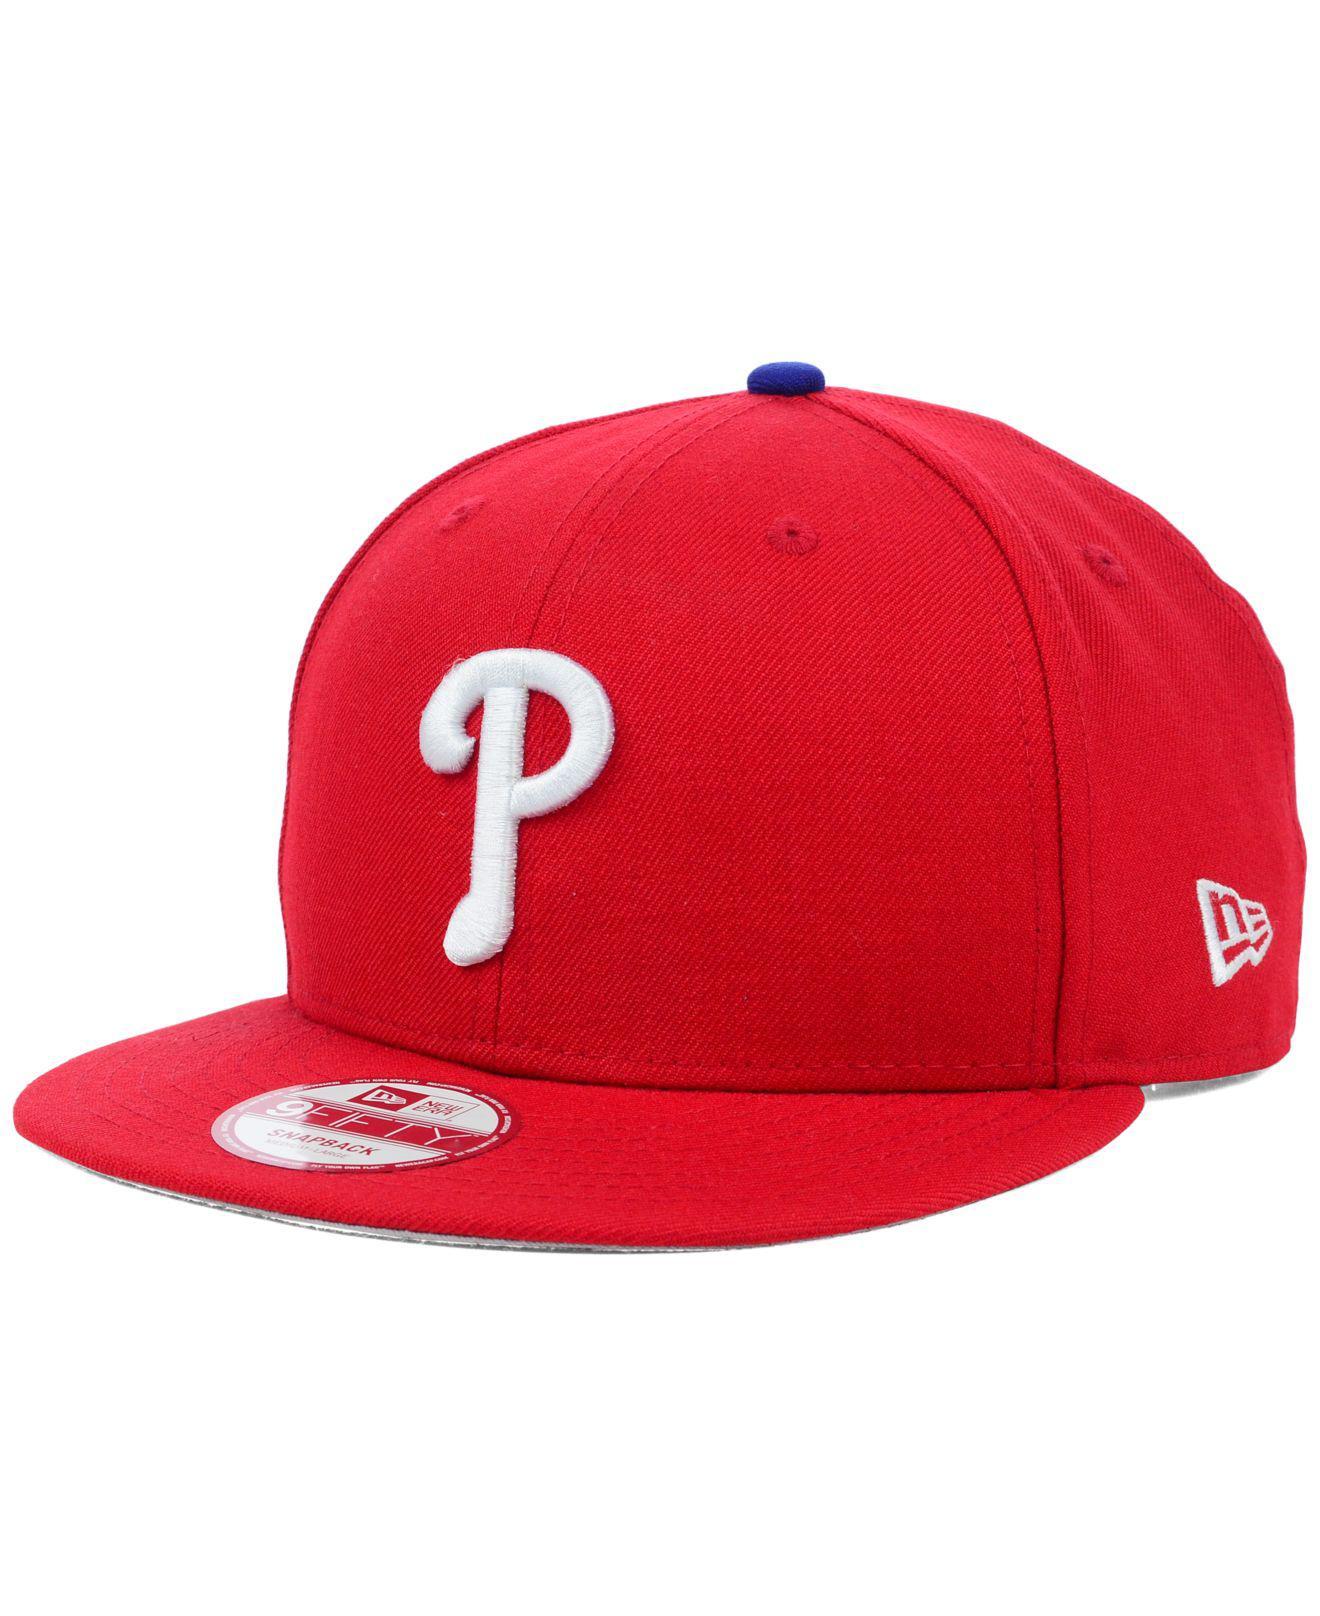 0835df73cf942 Lyst - KTZ Philadelphia Phillies Mlb 2 Tone Link 9fifty Snapback Cap ...